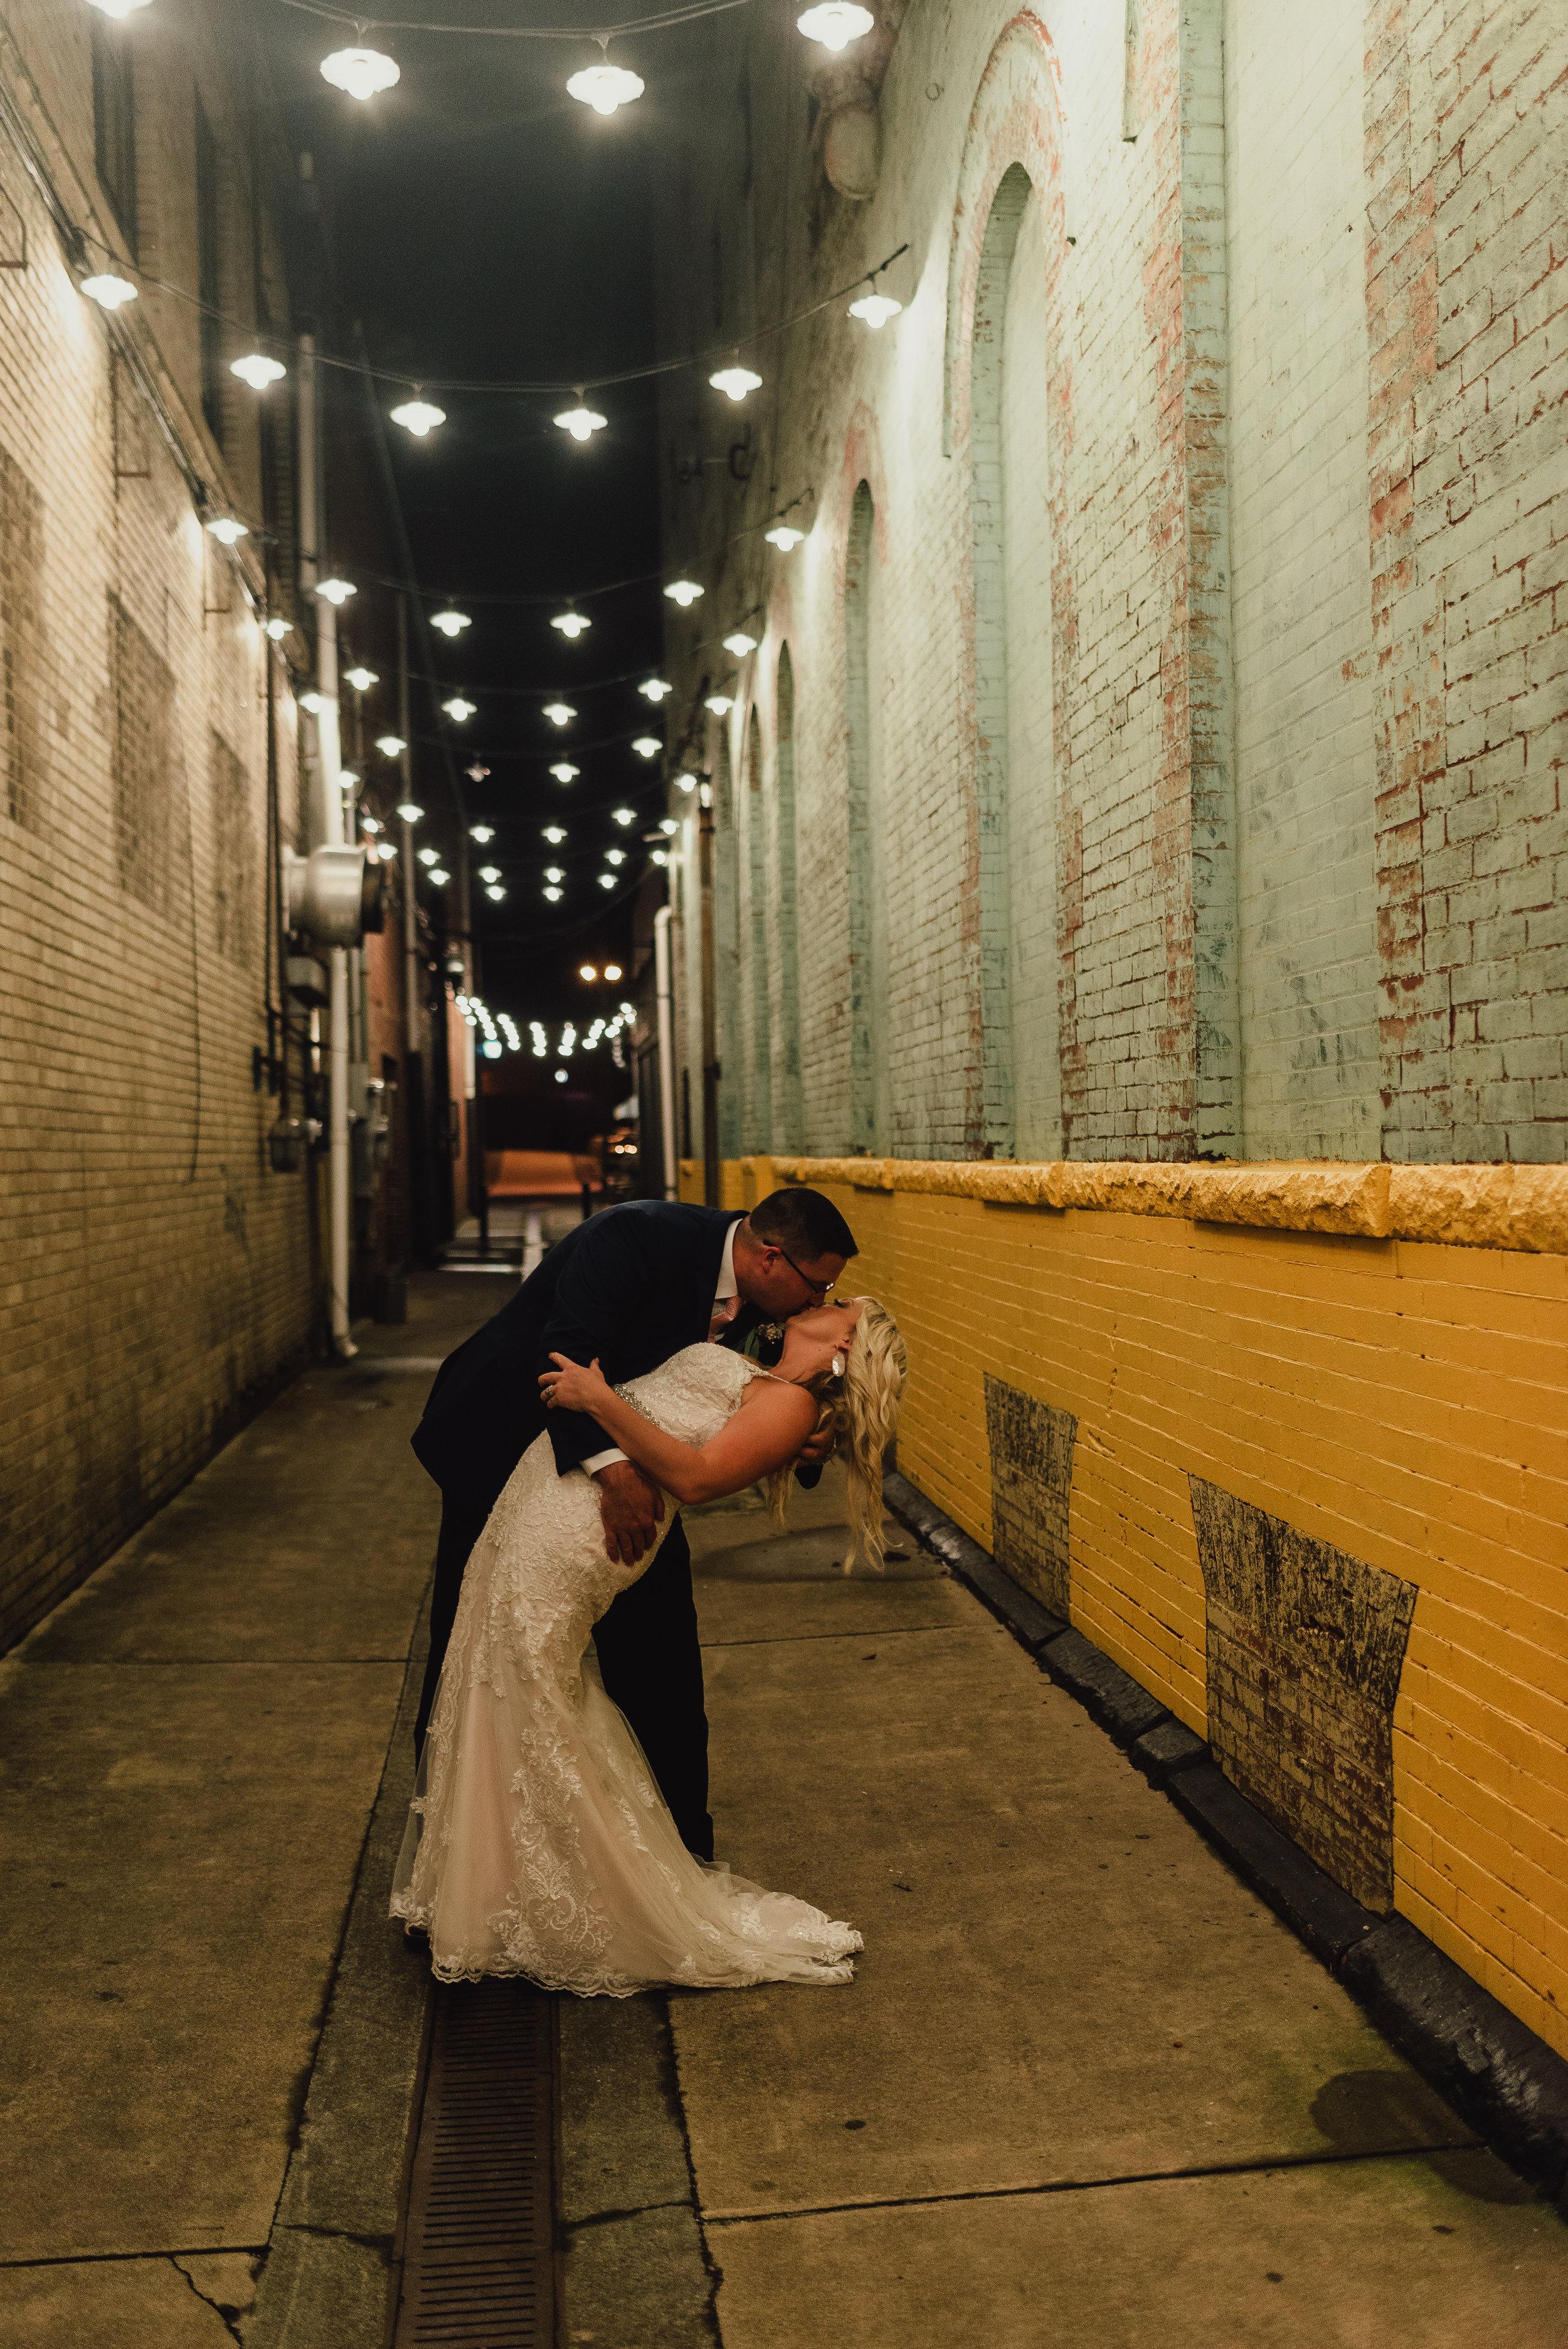 east-tn-wedding-photographer-tennessee-elopement-photographer-kingsport-tn-wedding-photographer (882 of 1001).jpg